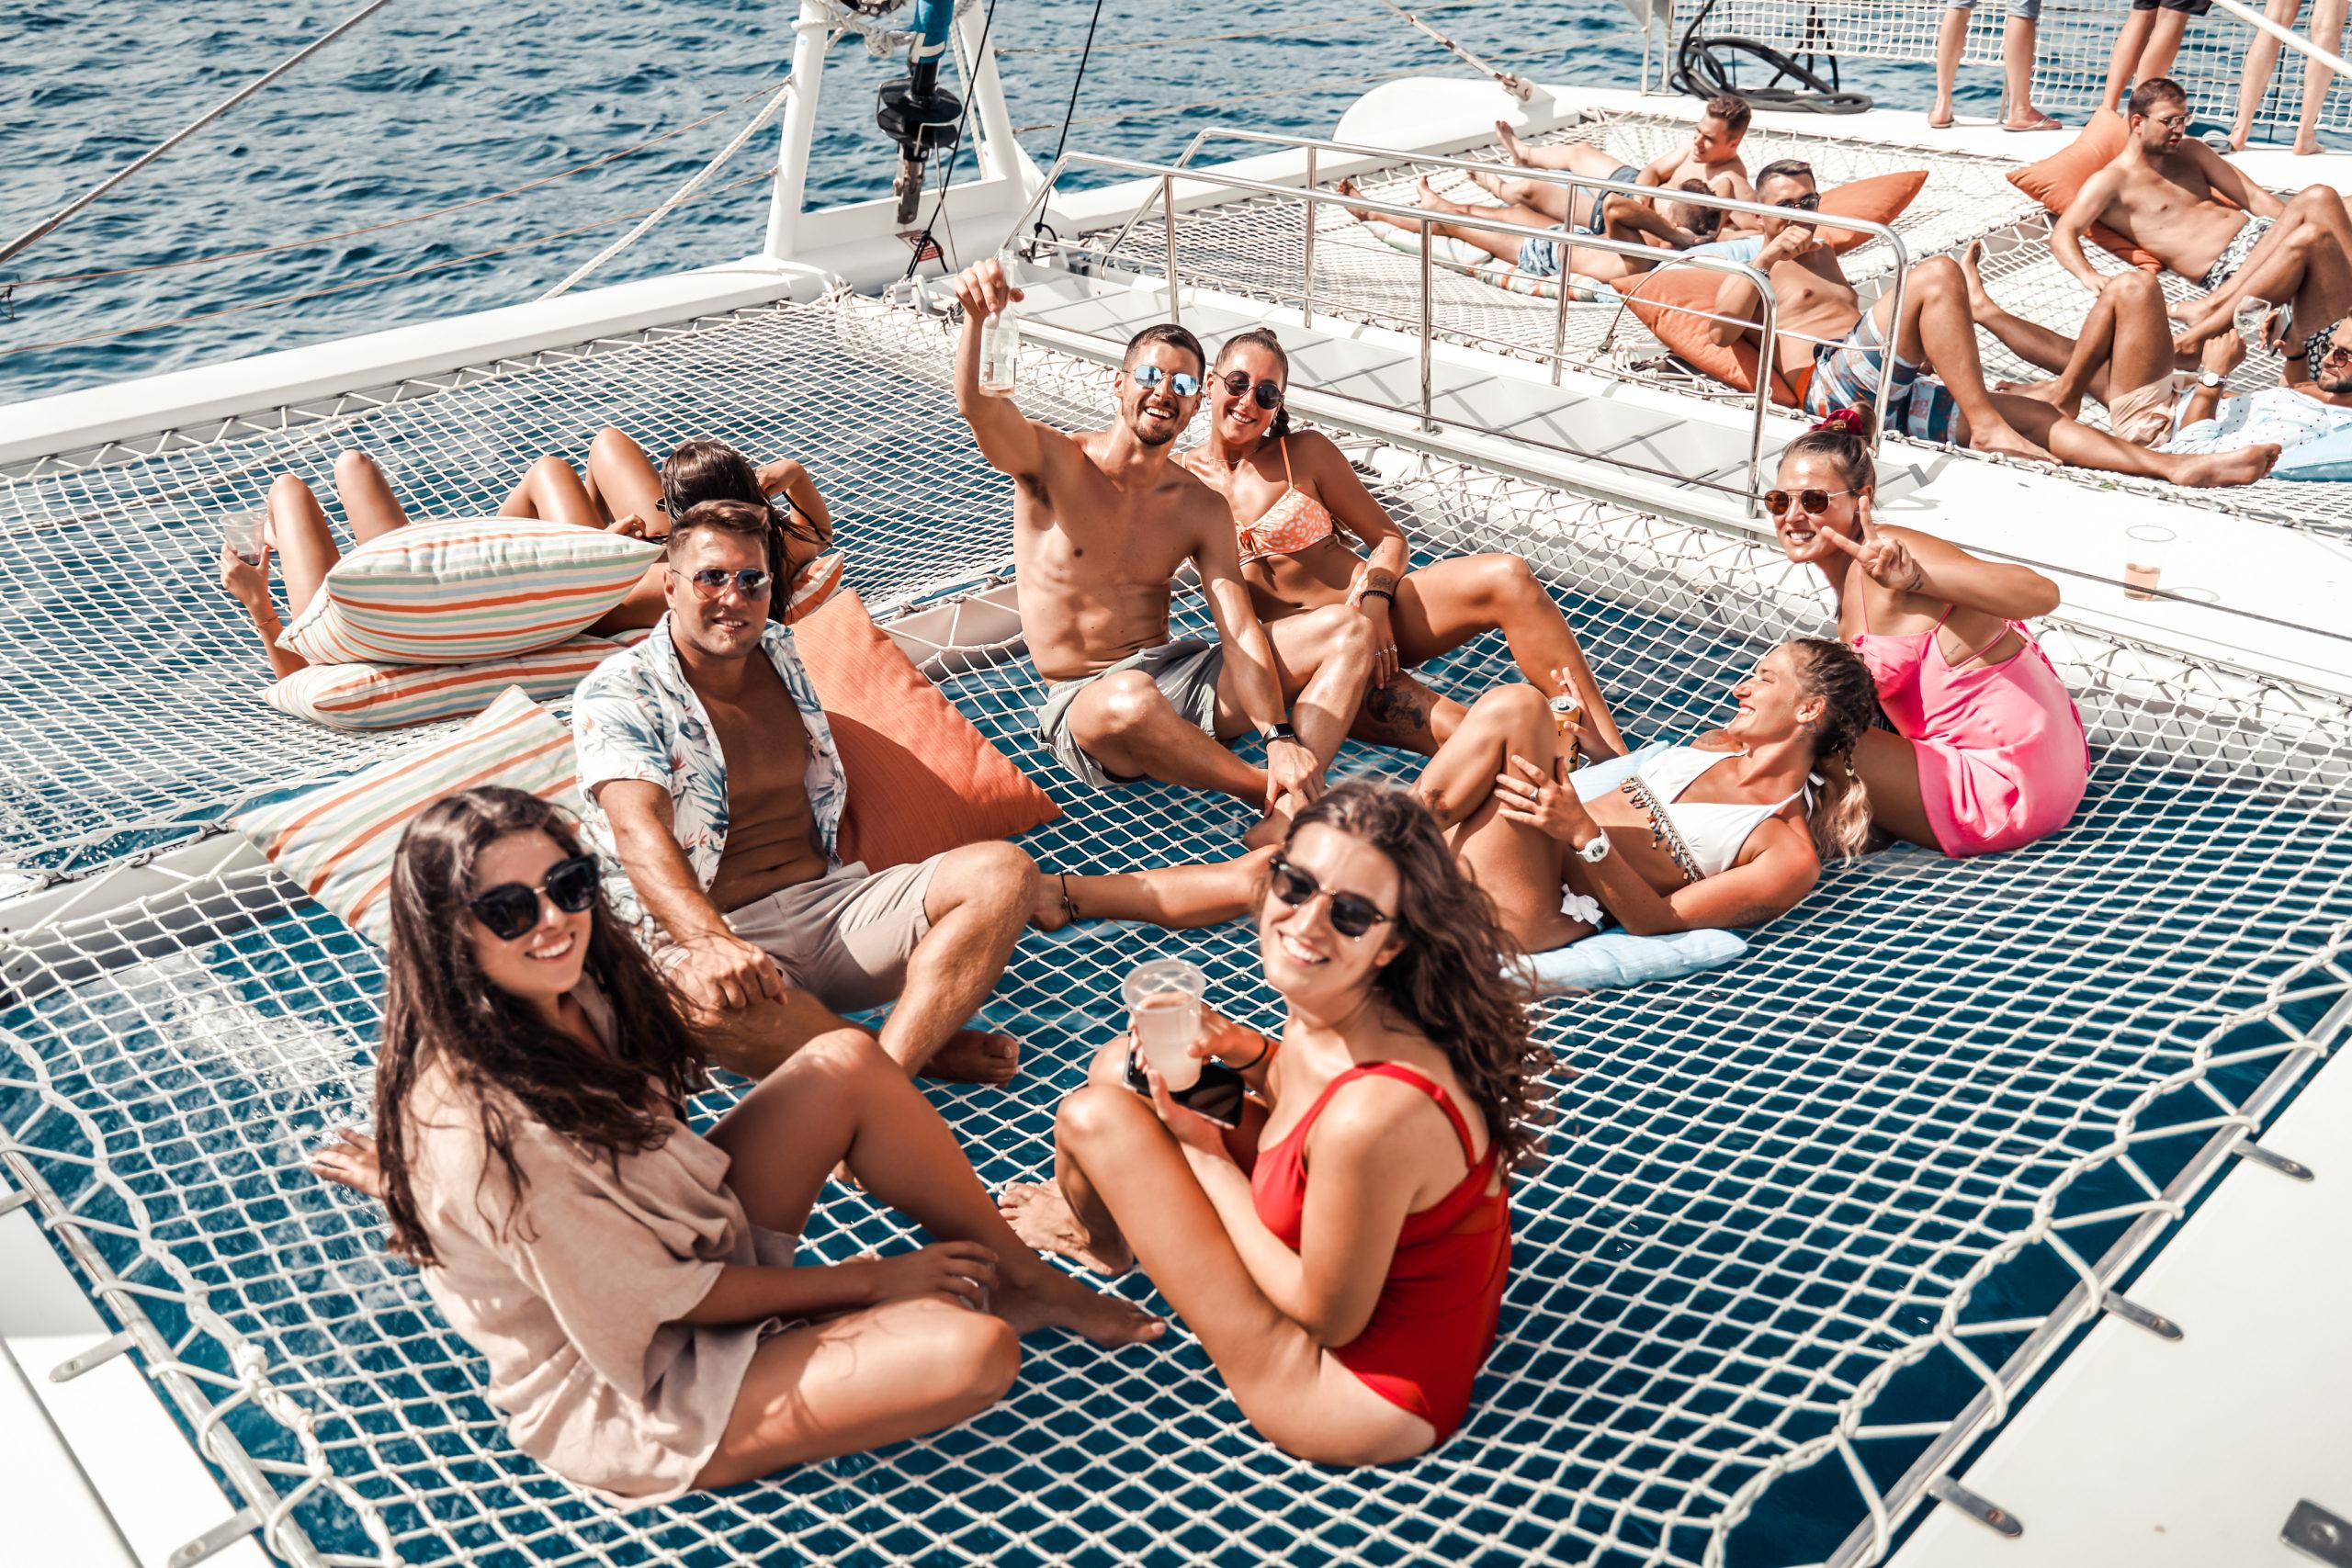 My Birthday Party at Catamaran Tahiti The Largest Sailing Party Boat in